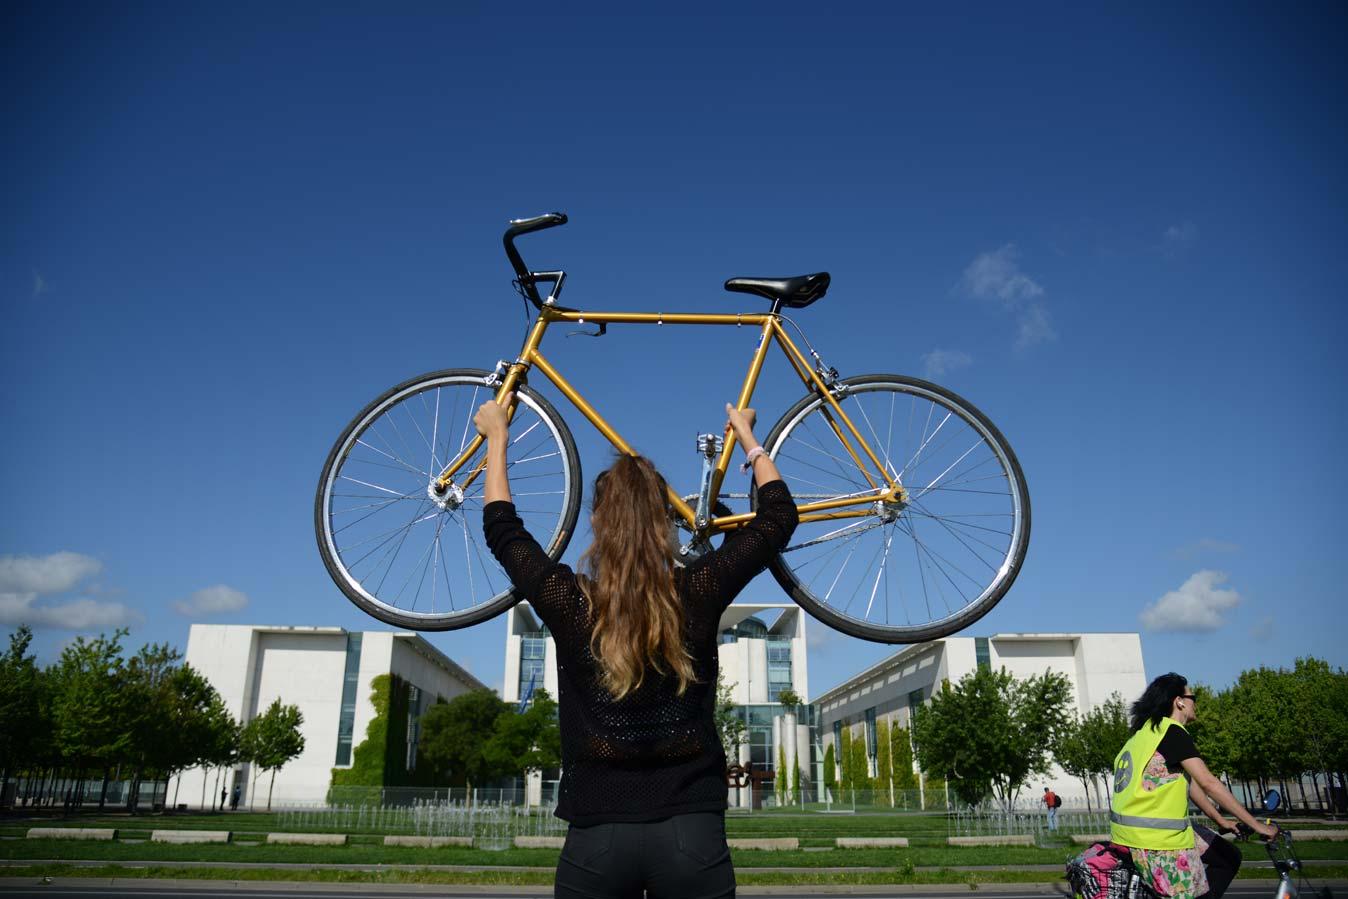 FLOTTWELL BERLIN Hotel - Berlin Bicycle City